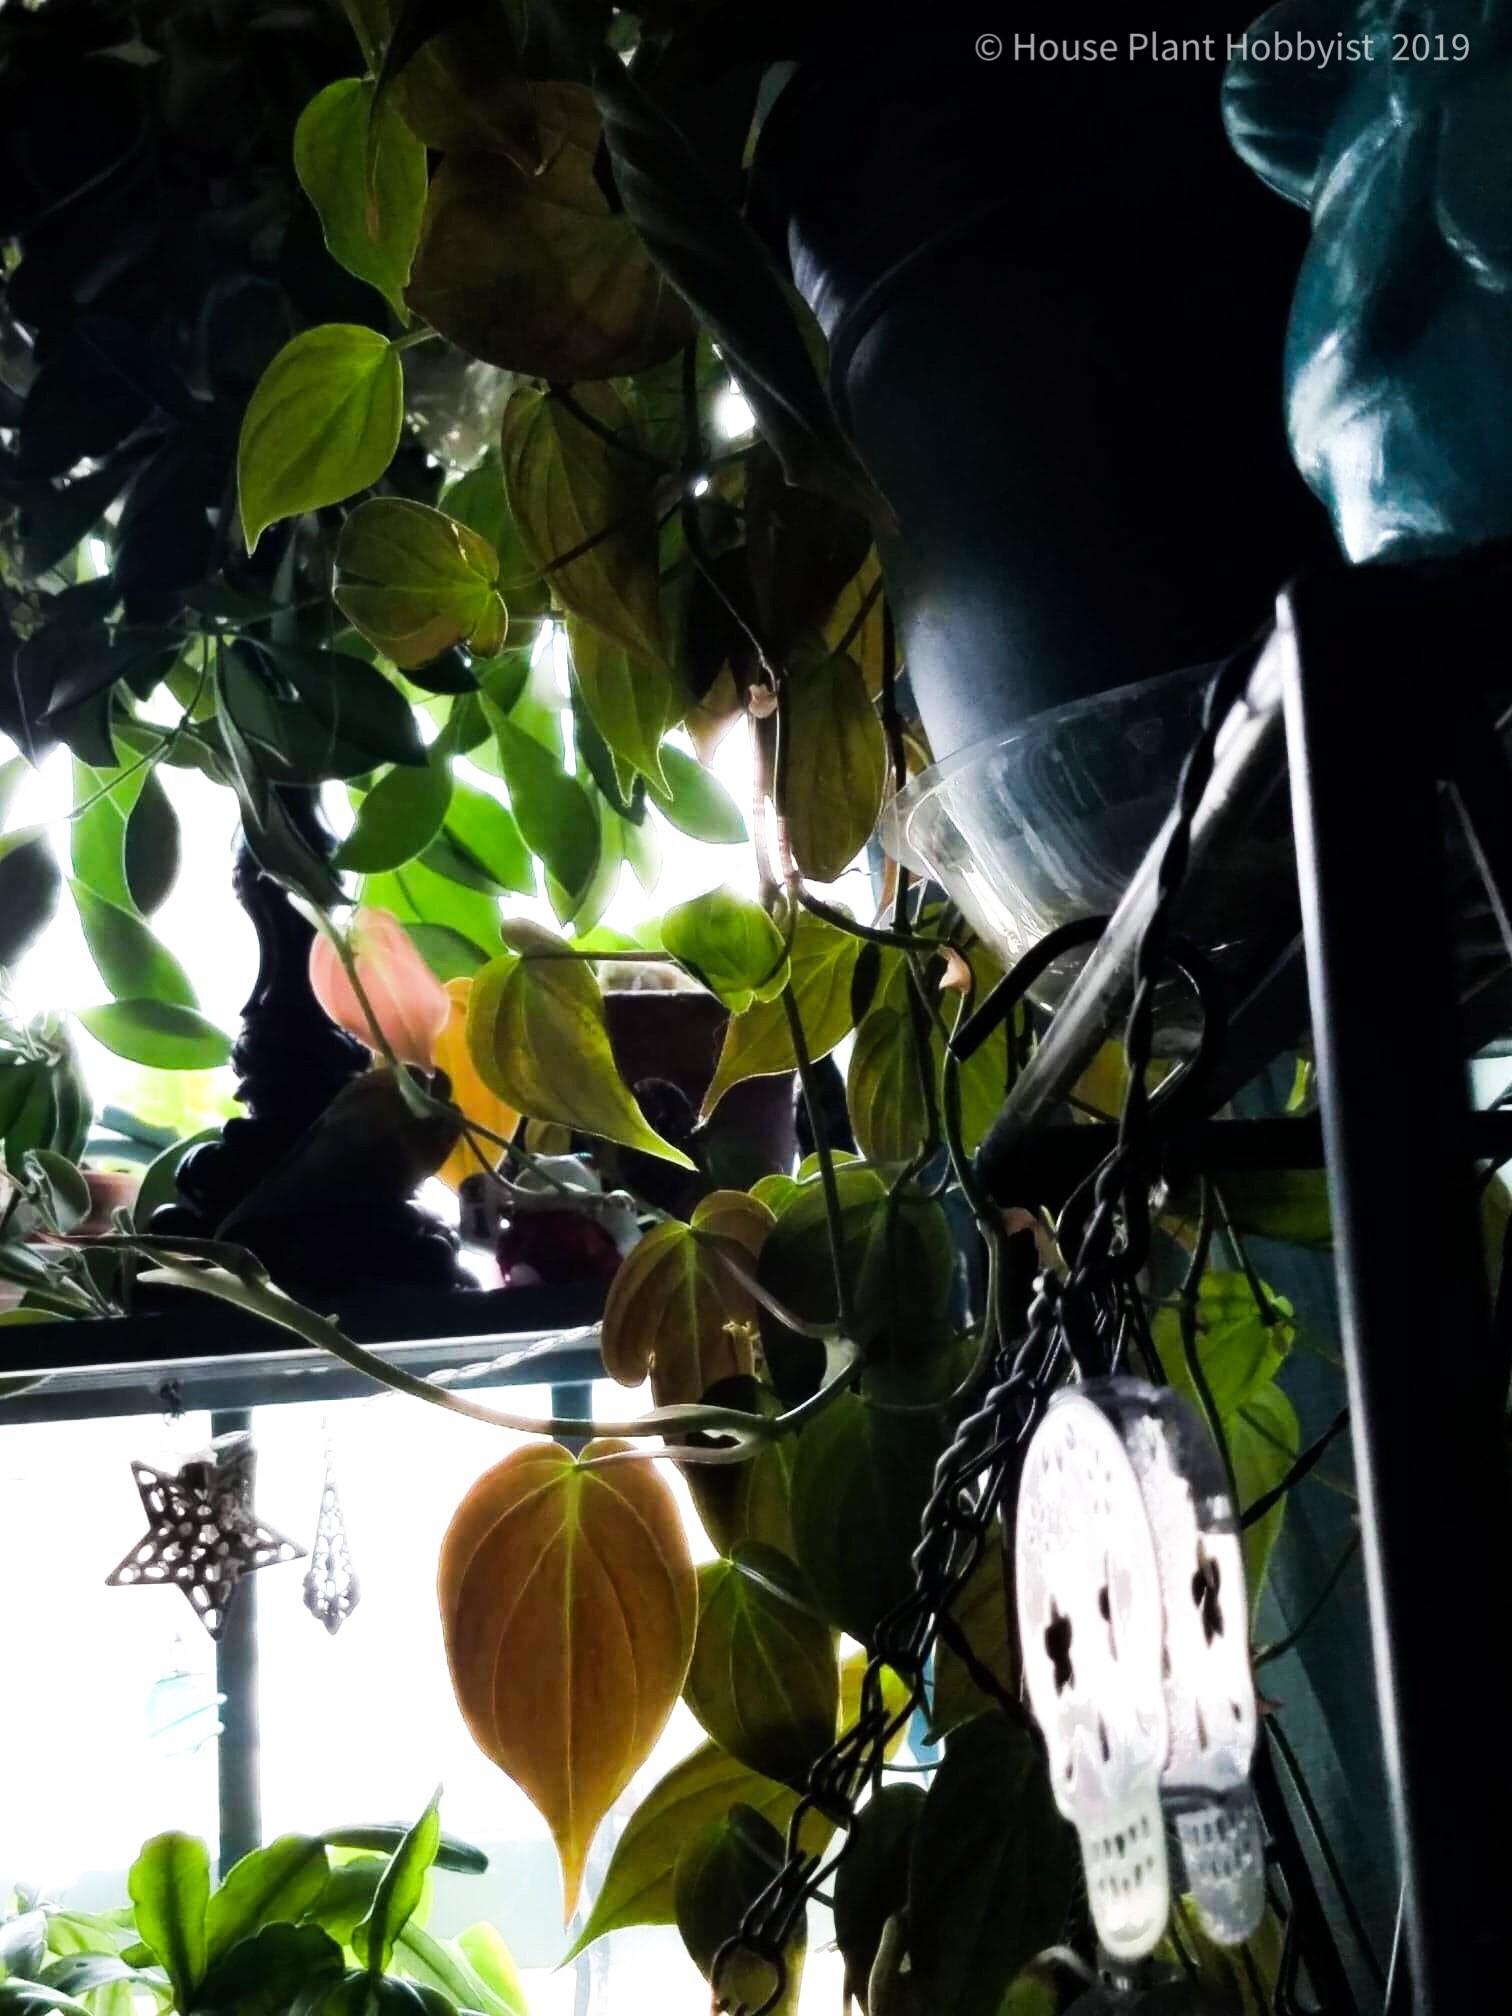 Philodendron hederaceum var. hedarceum 'micans'